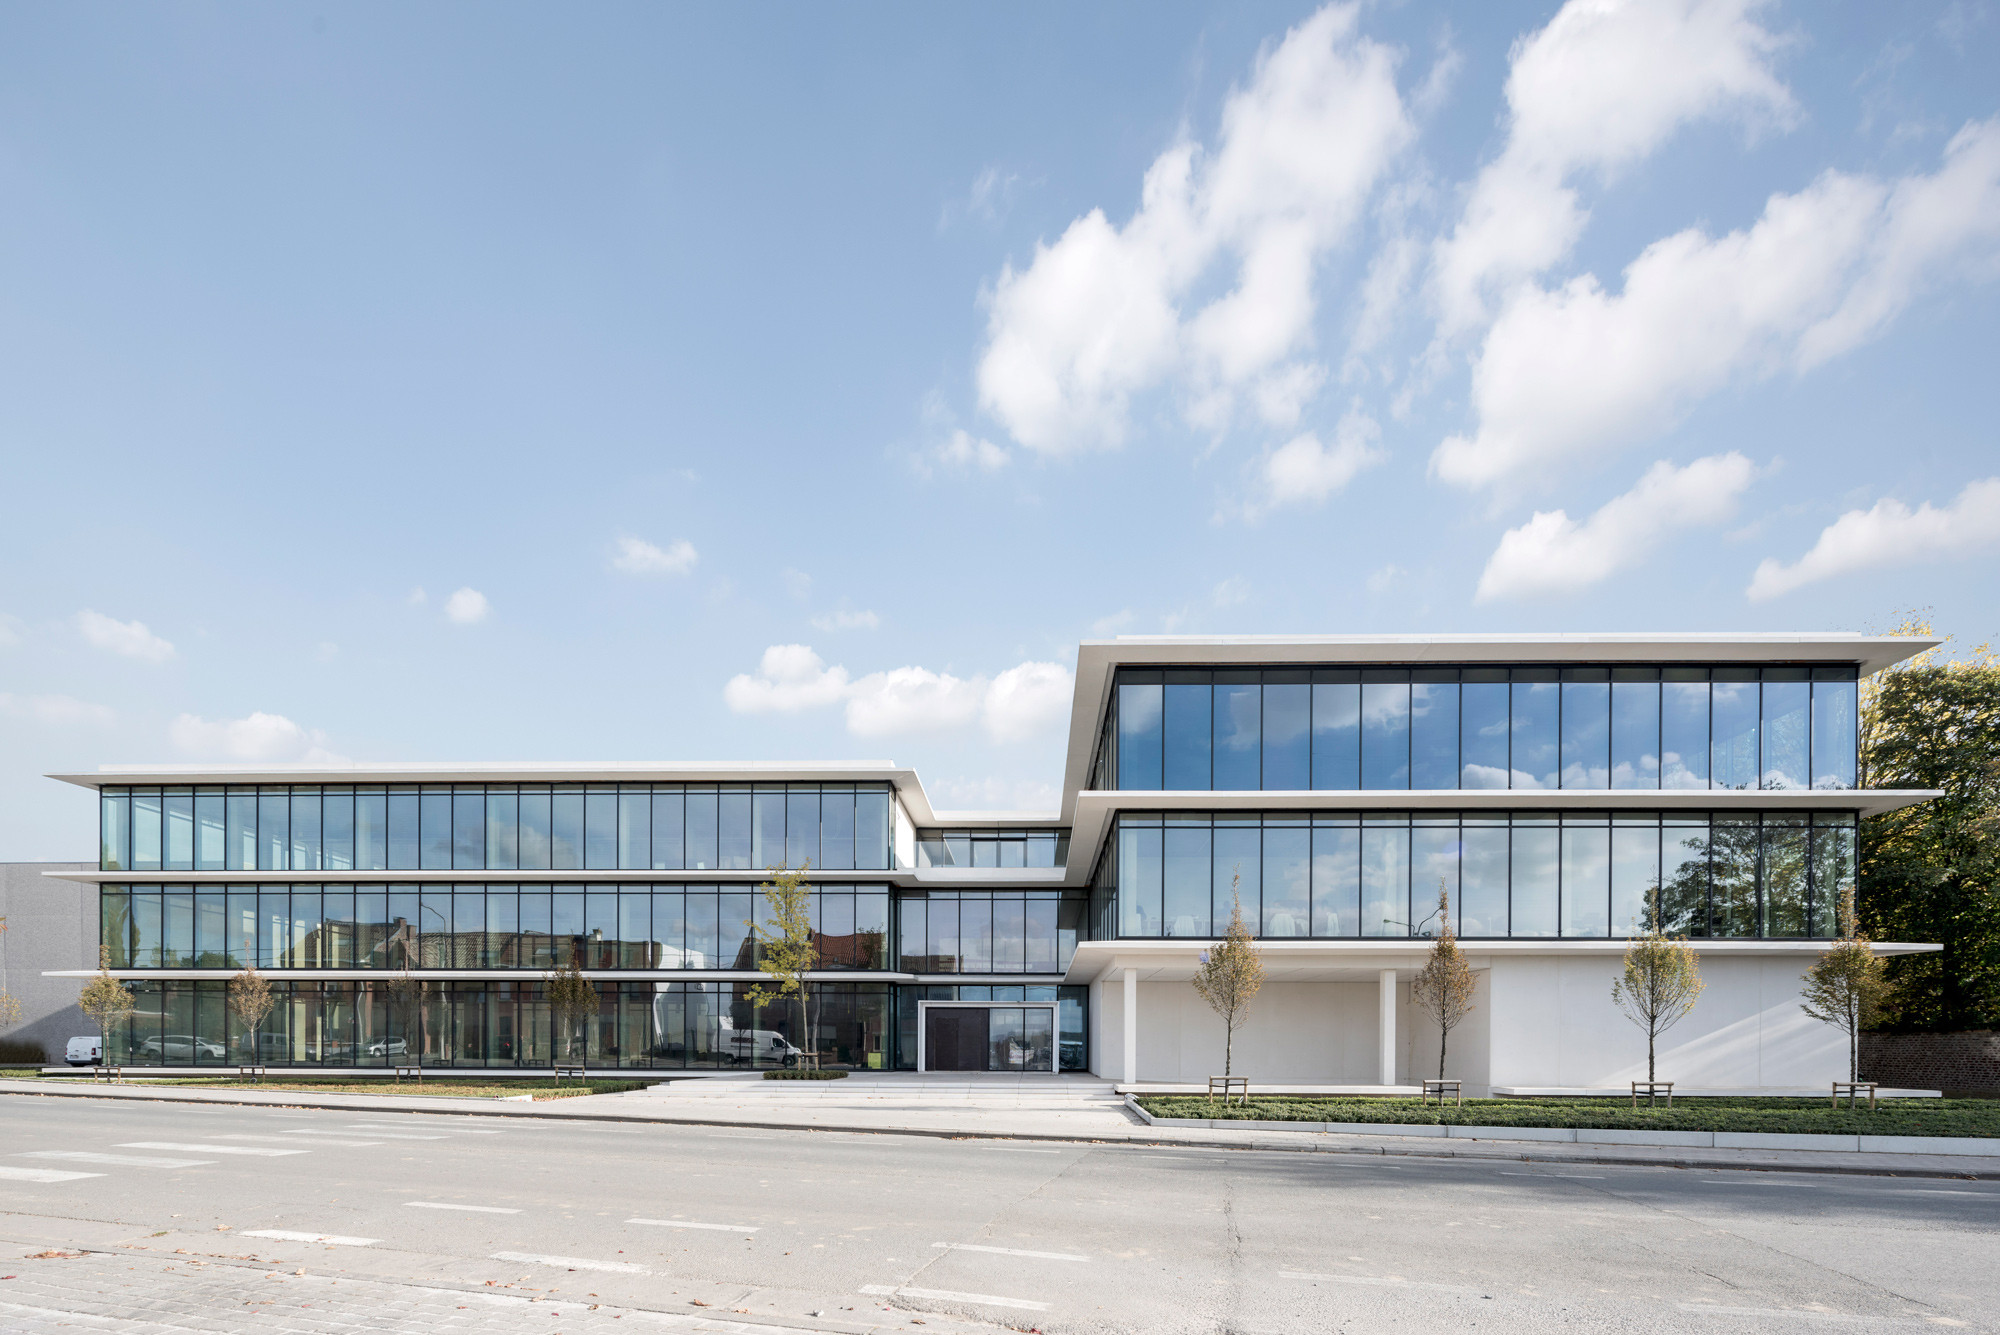 Kantoorgebouw3_Nieuwkerke_Claeys Architecten.jpg